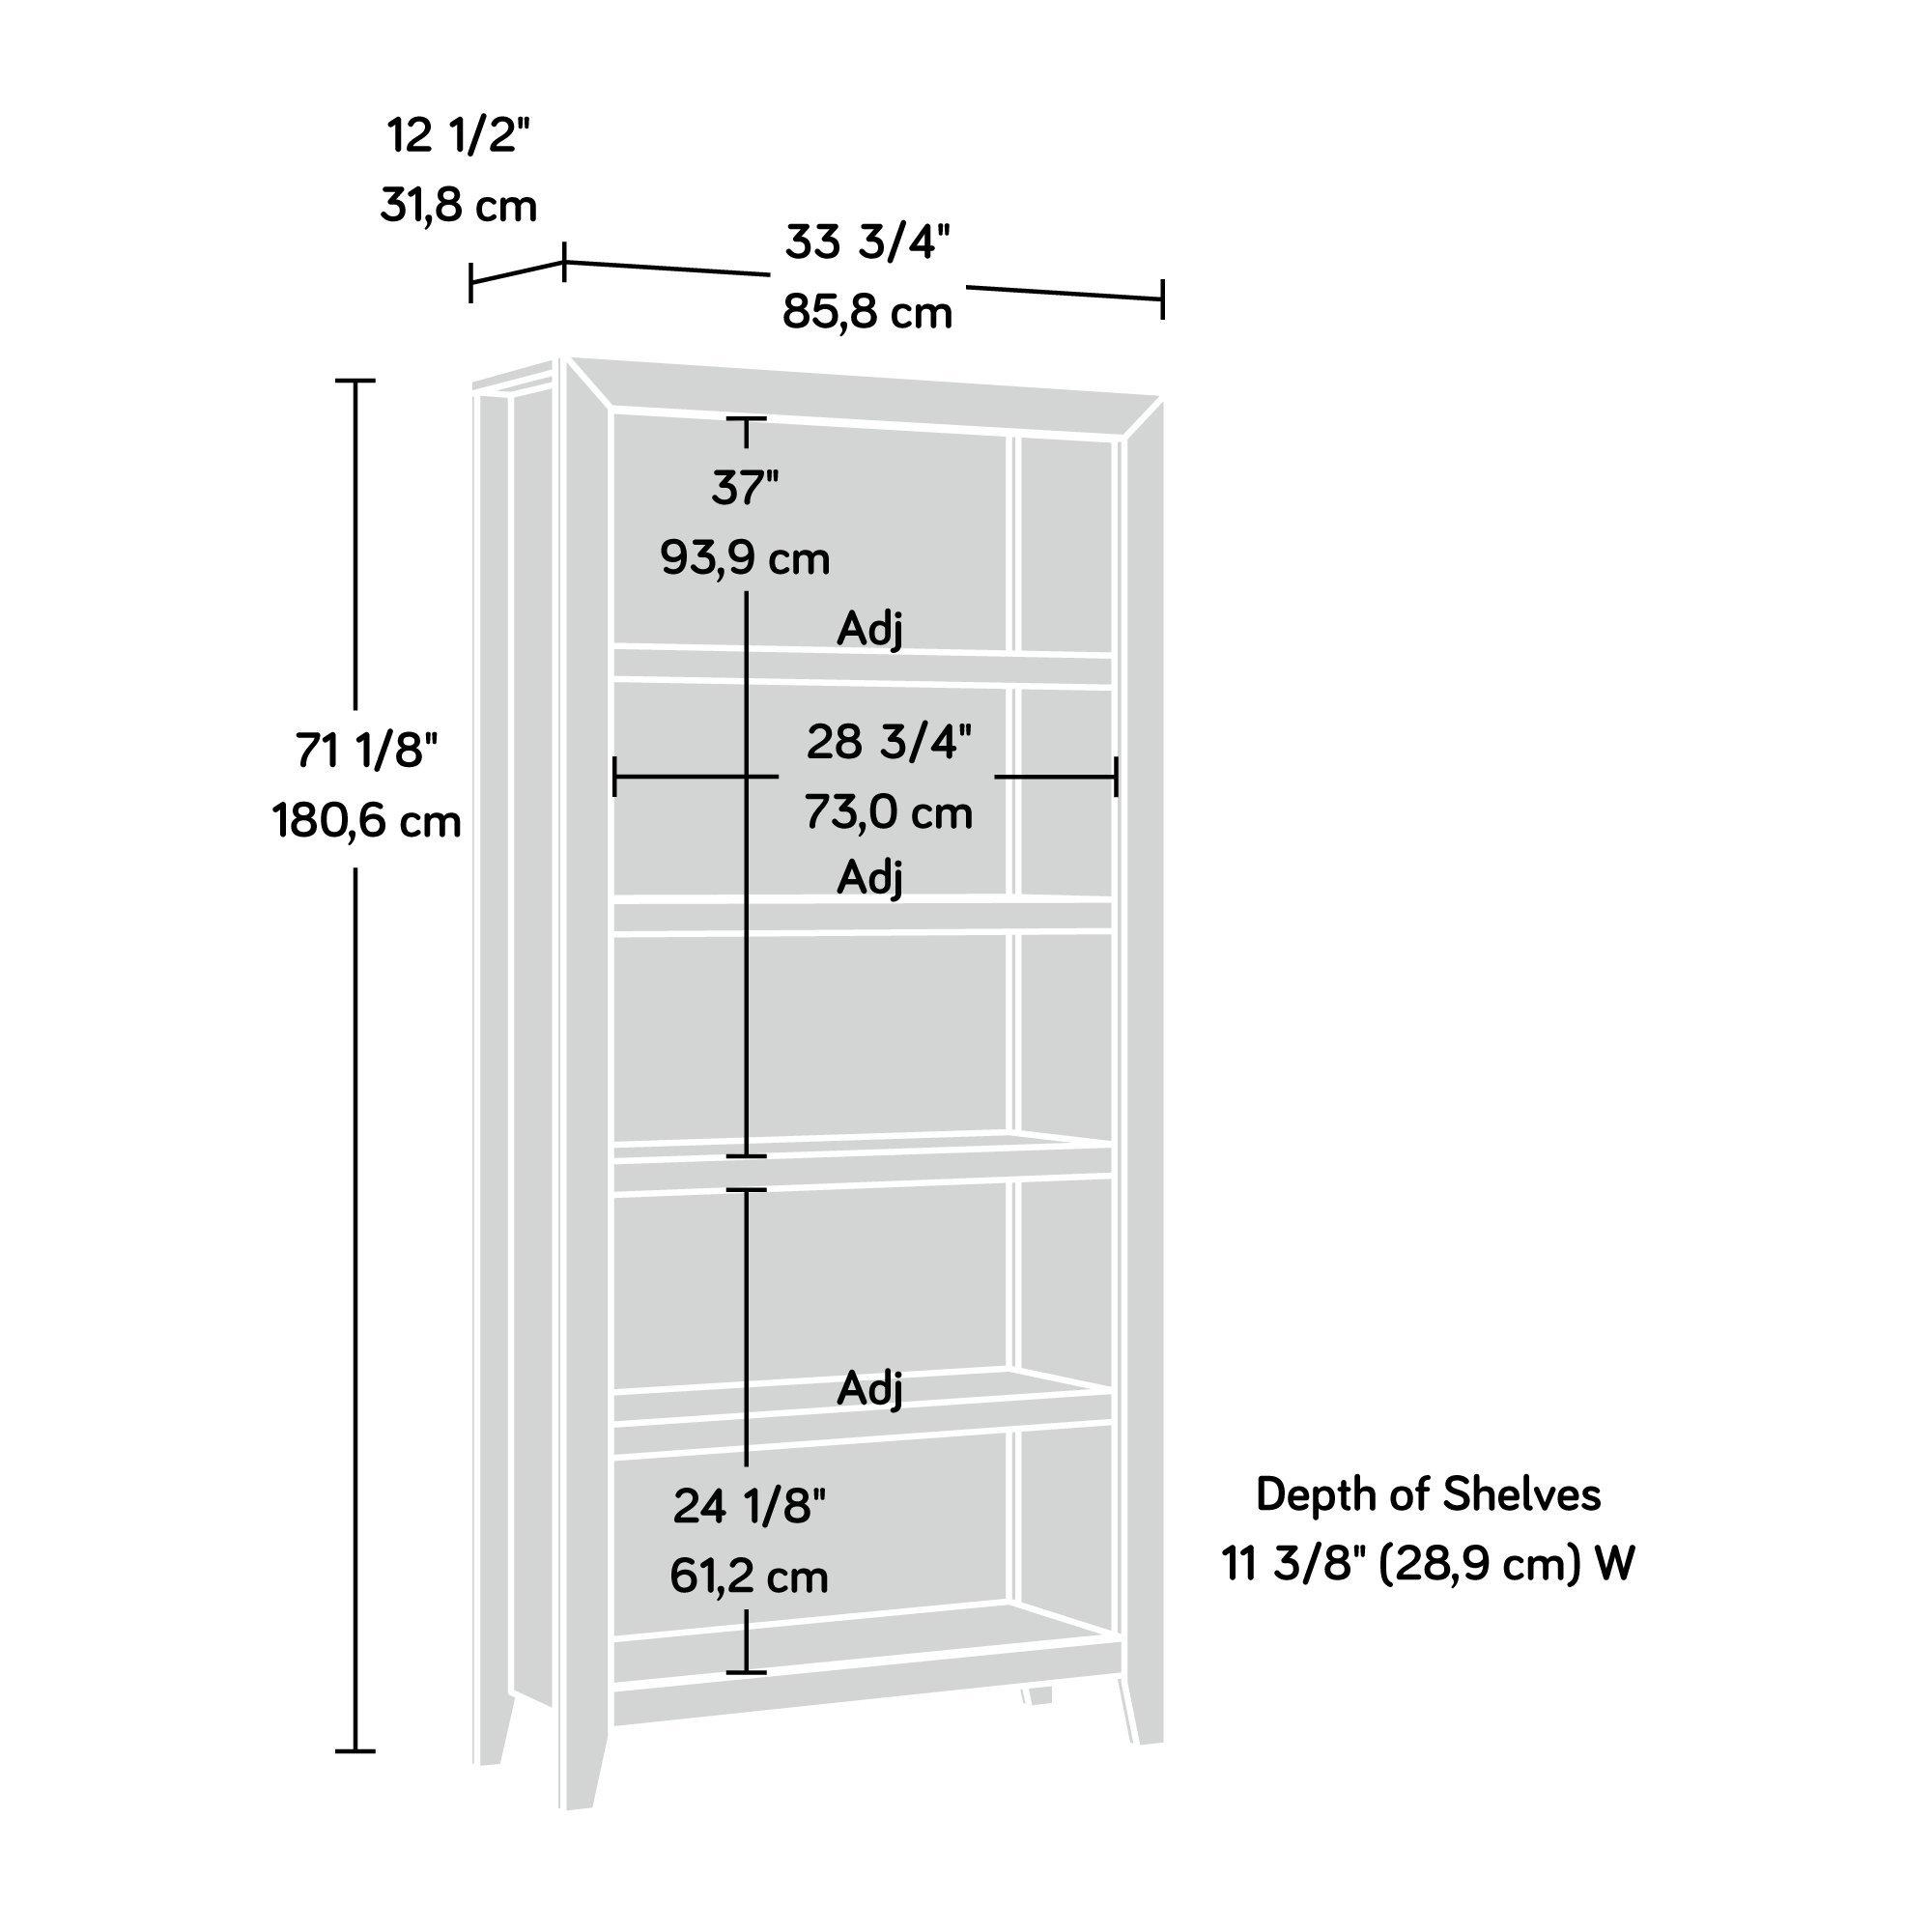 Sauder 418546 Dakota Pass 5-Shelf Bookcase, L: 33.78'' x W: 12.52'' x H: 71.1, Craftsman Oak finish by Sauder (Image #6)